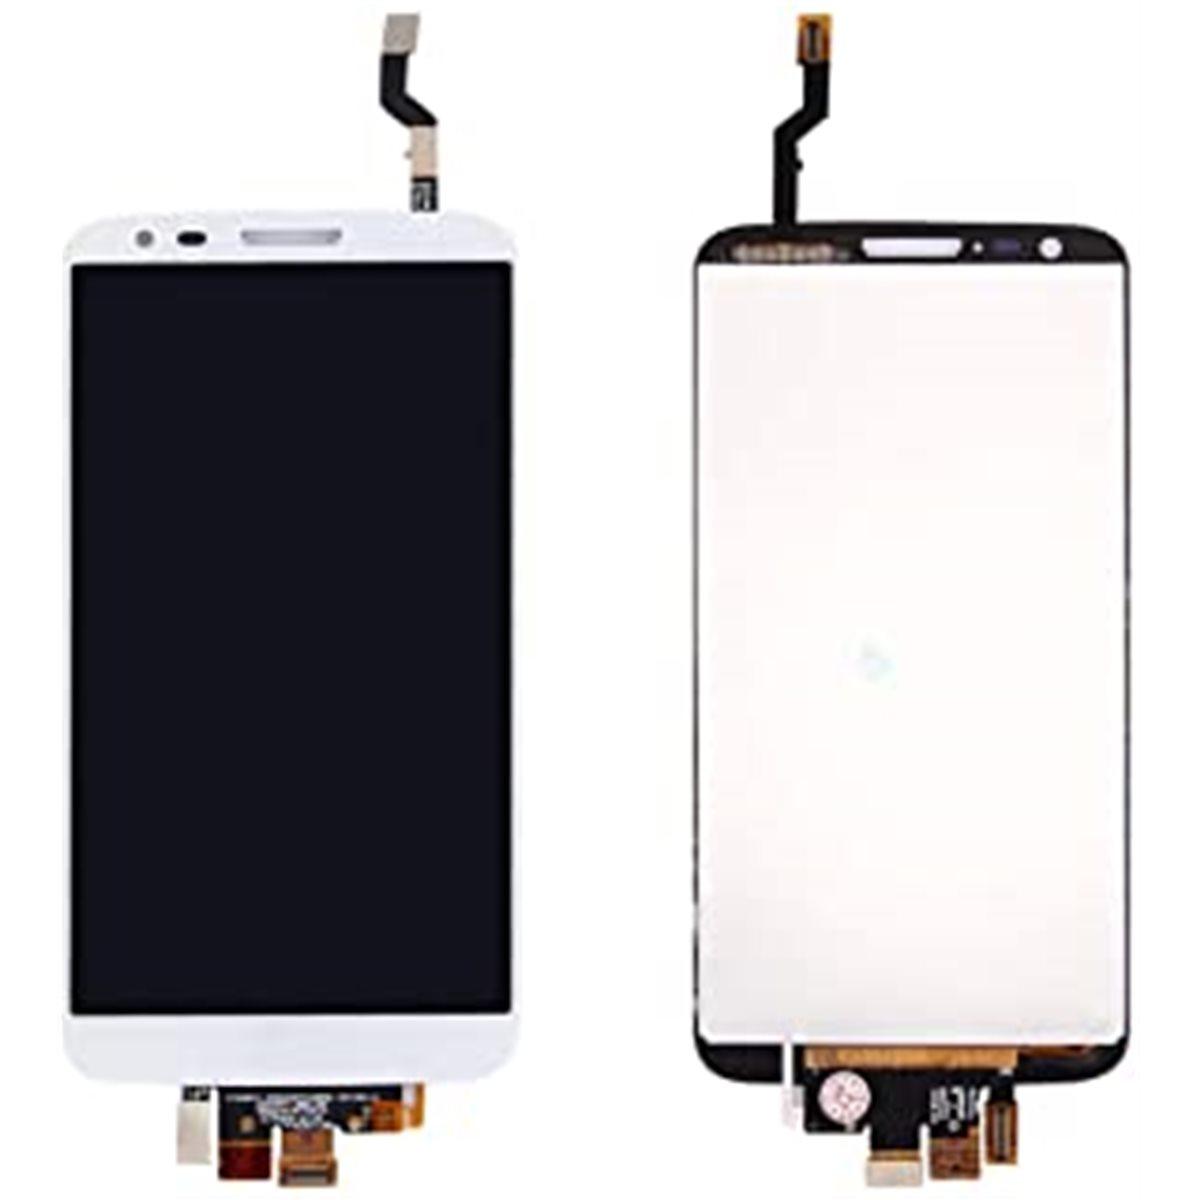 Pantalla lcd + tactil sin marco LG Optimus G2 D802 E940 blanca